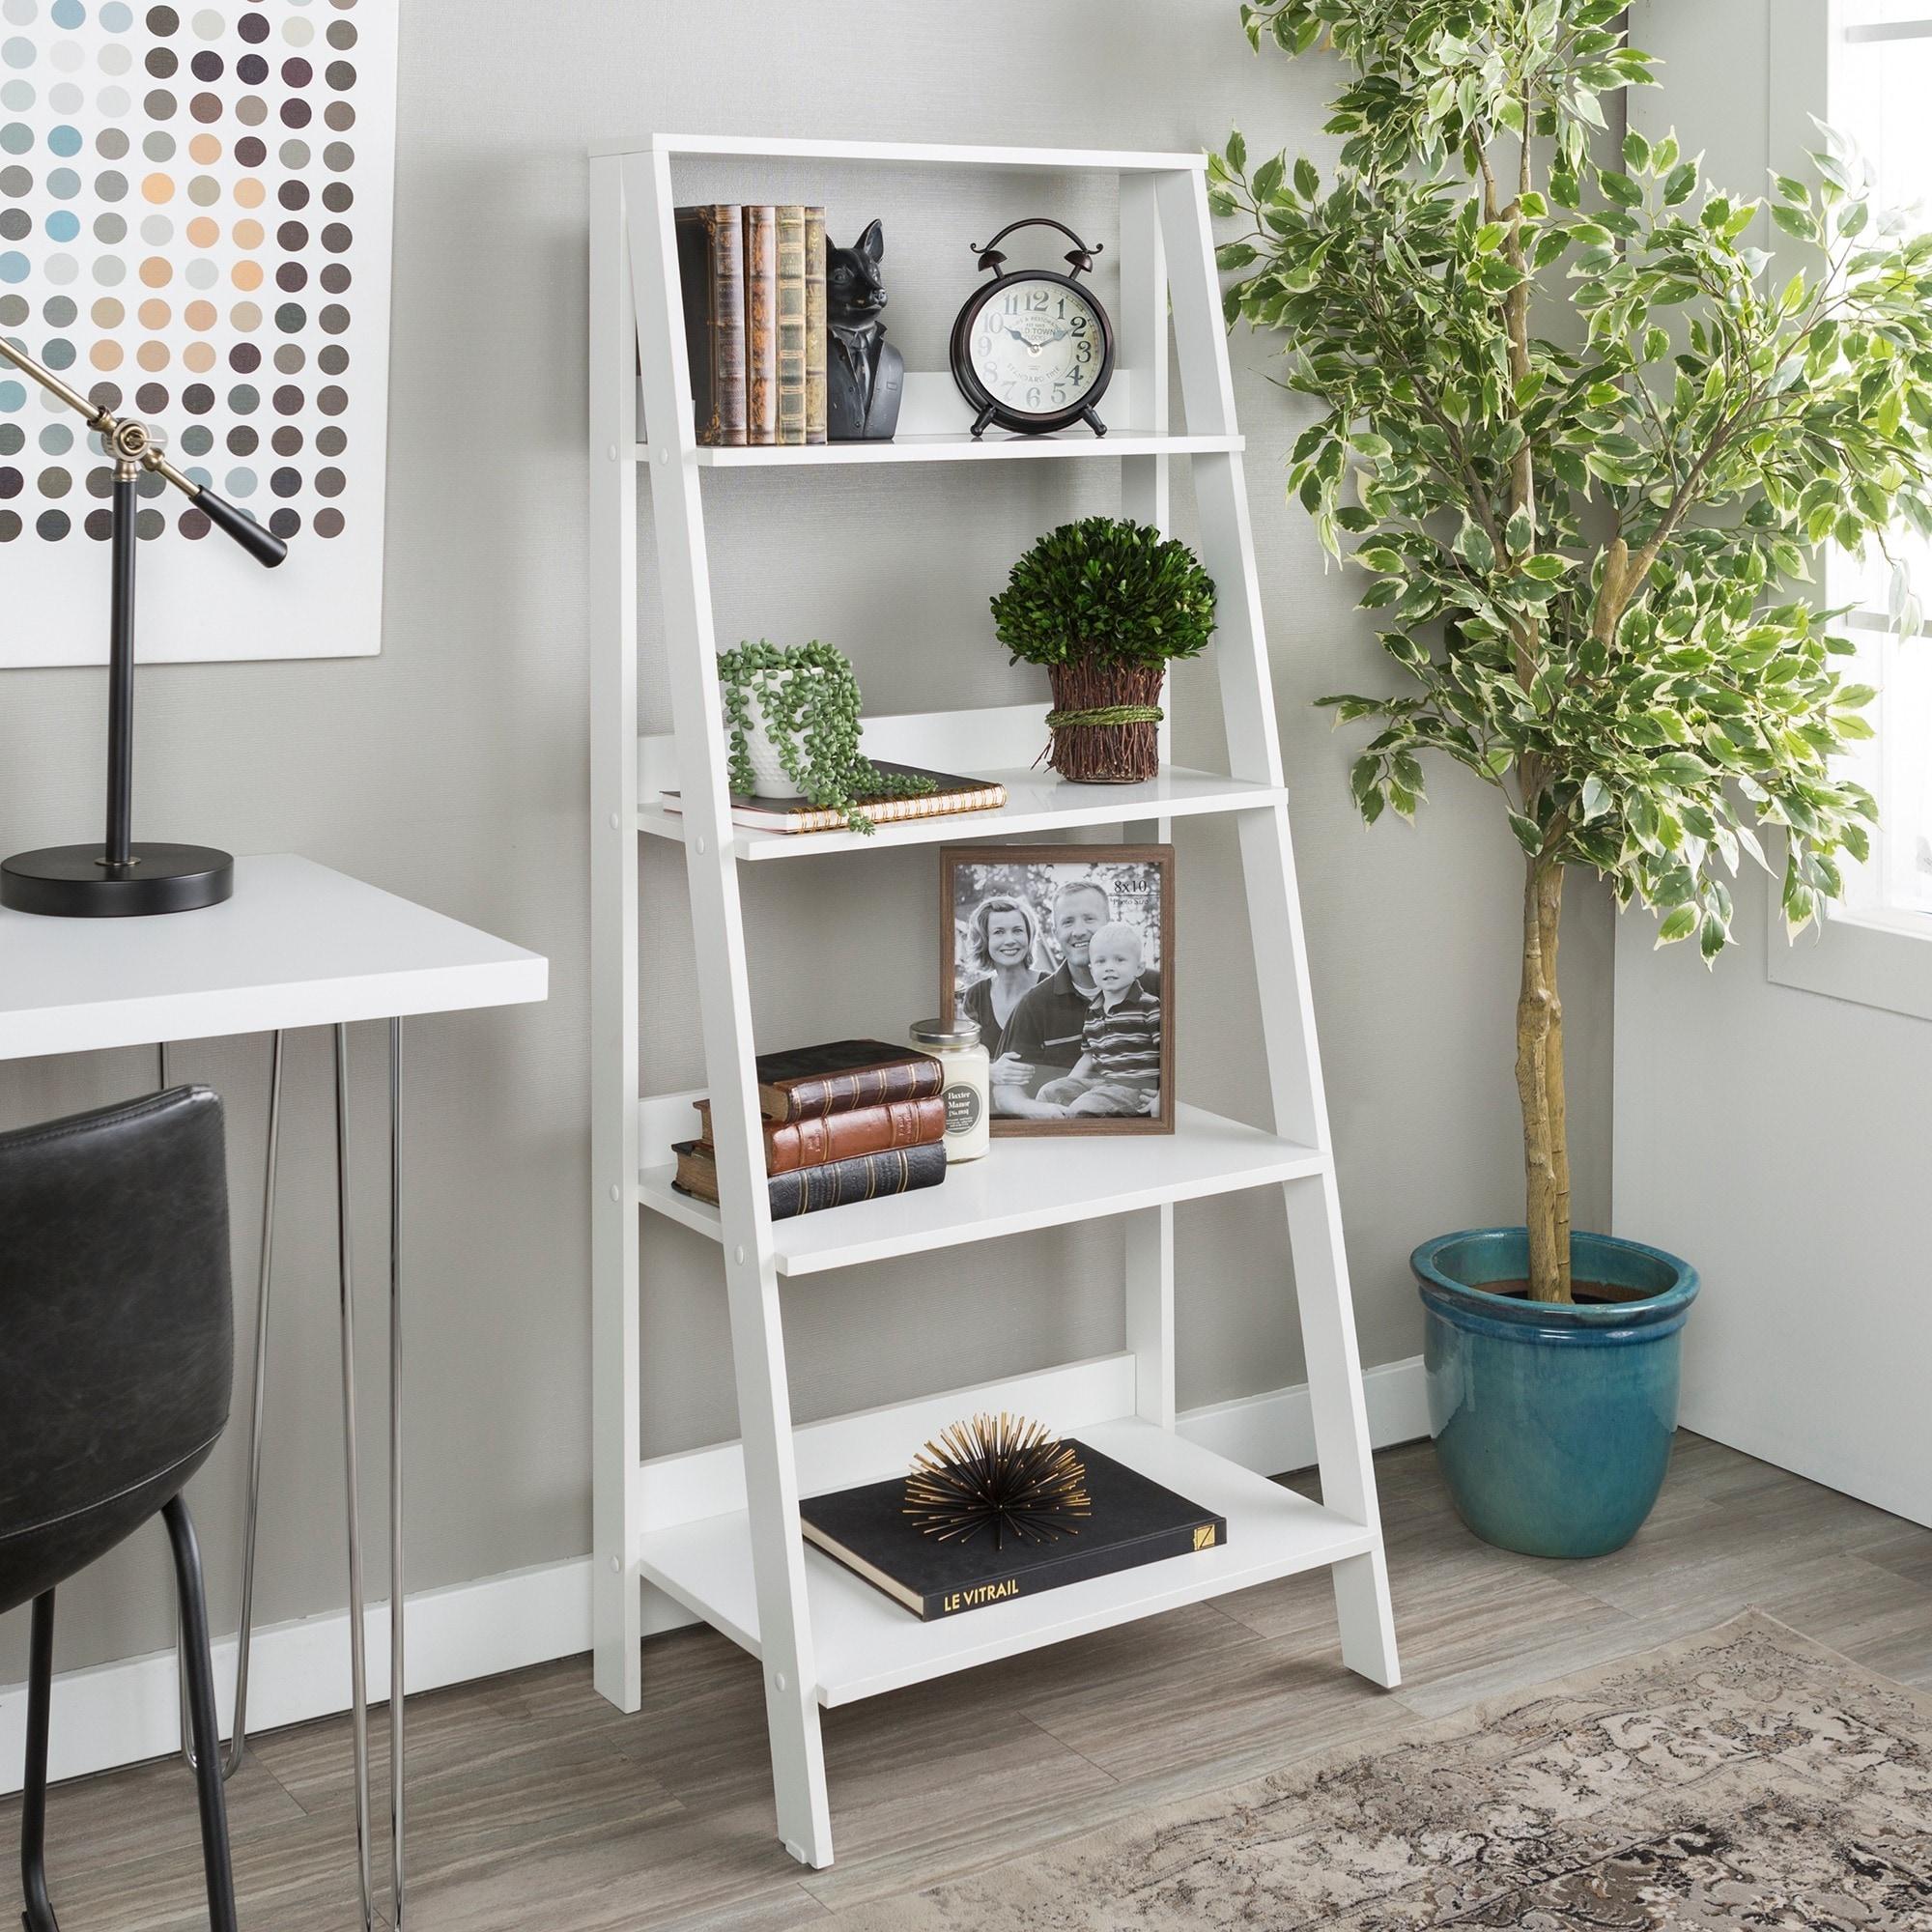 Buy Bookshelves Bookcases Online At Overstock